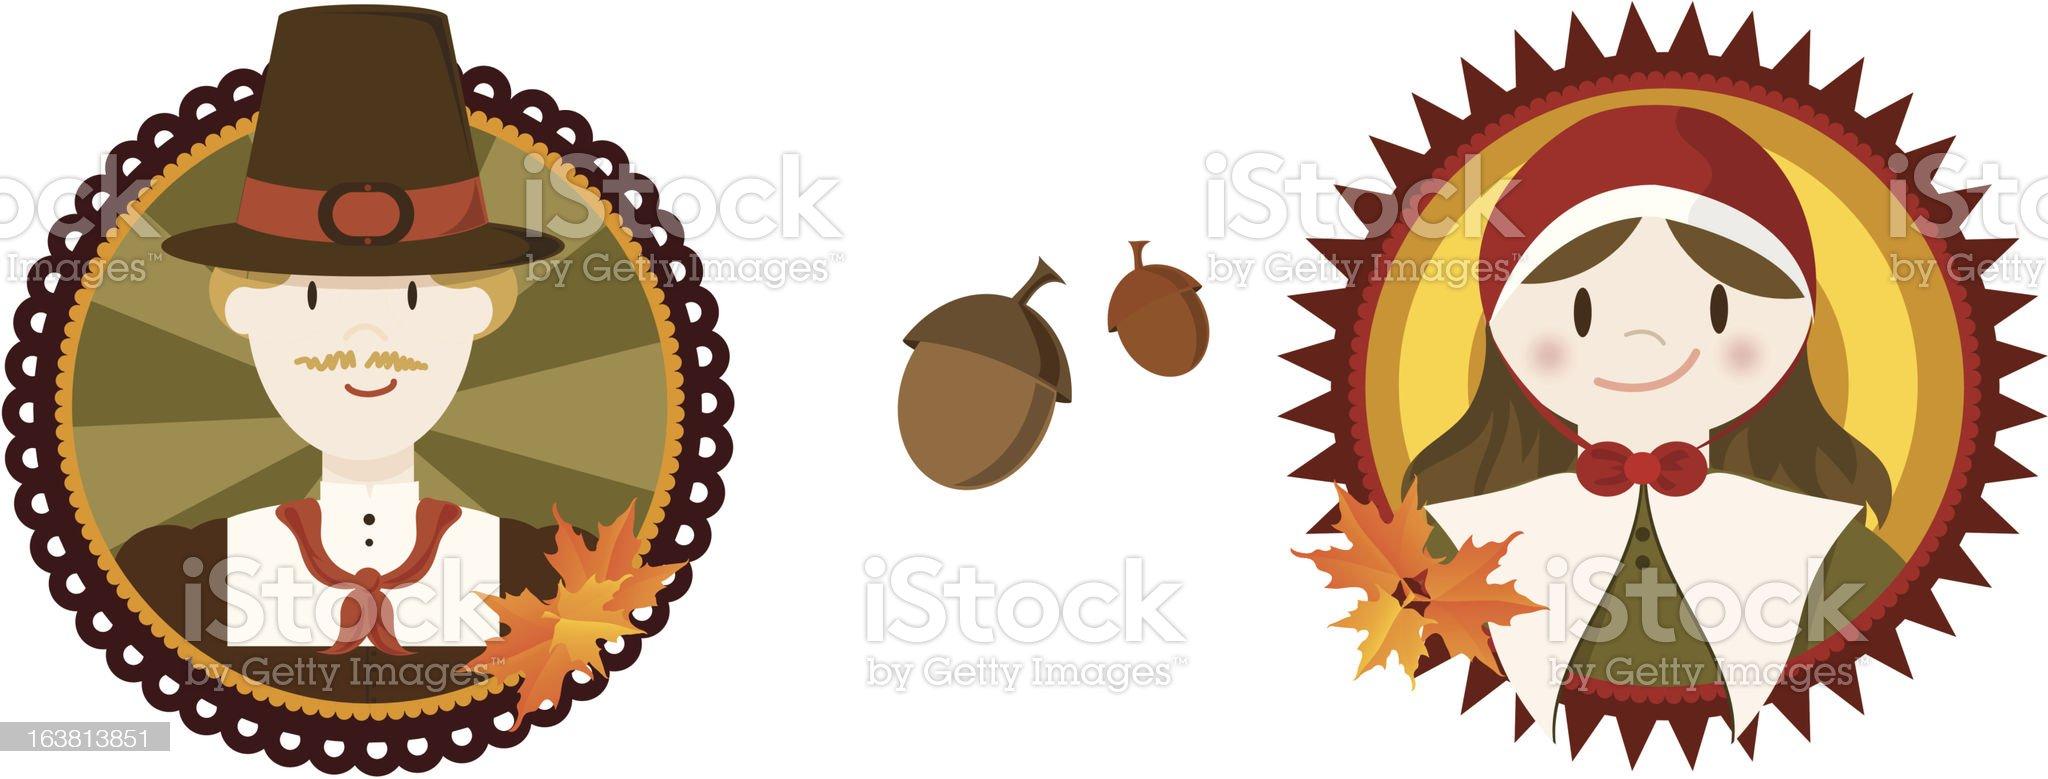 Thanksgiving Pilgrims royalty-free stock vector art